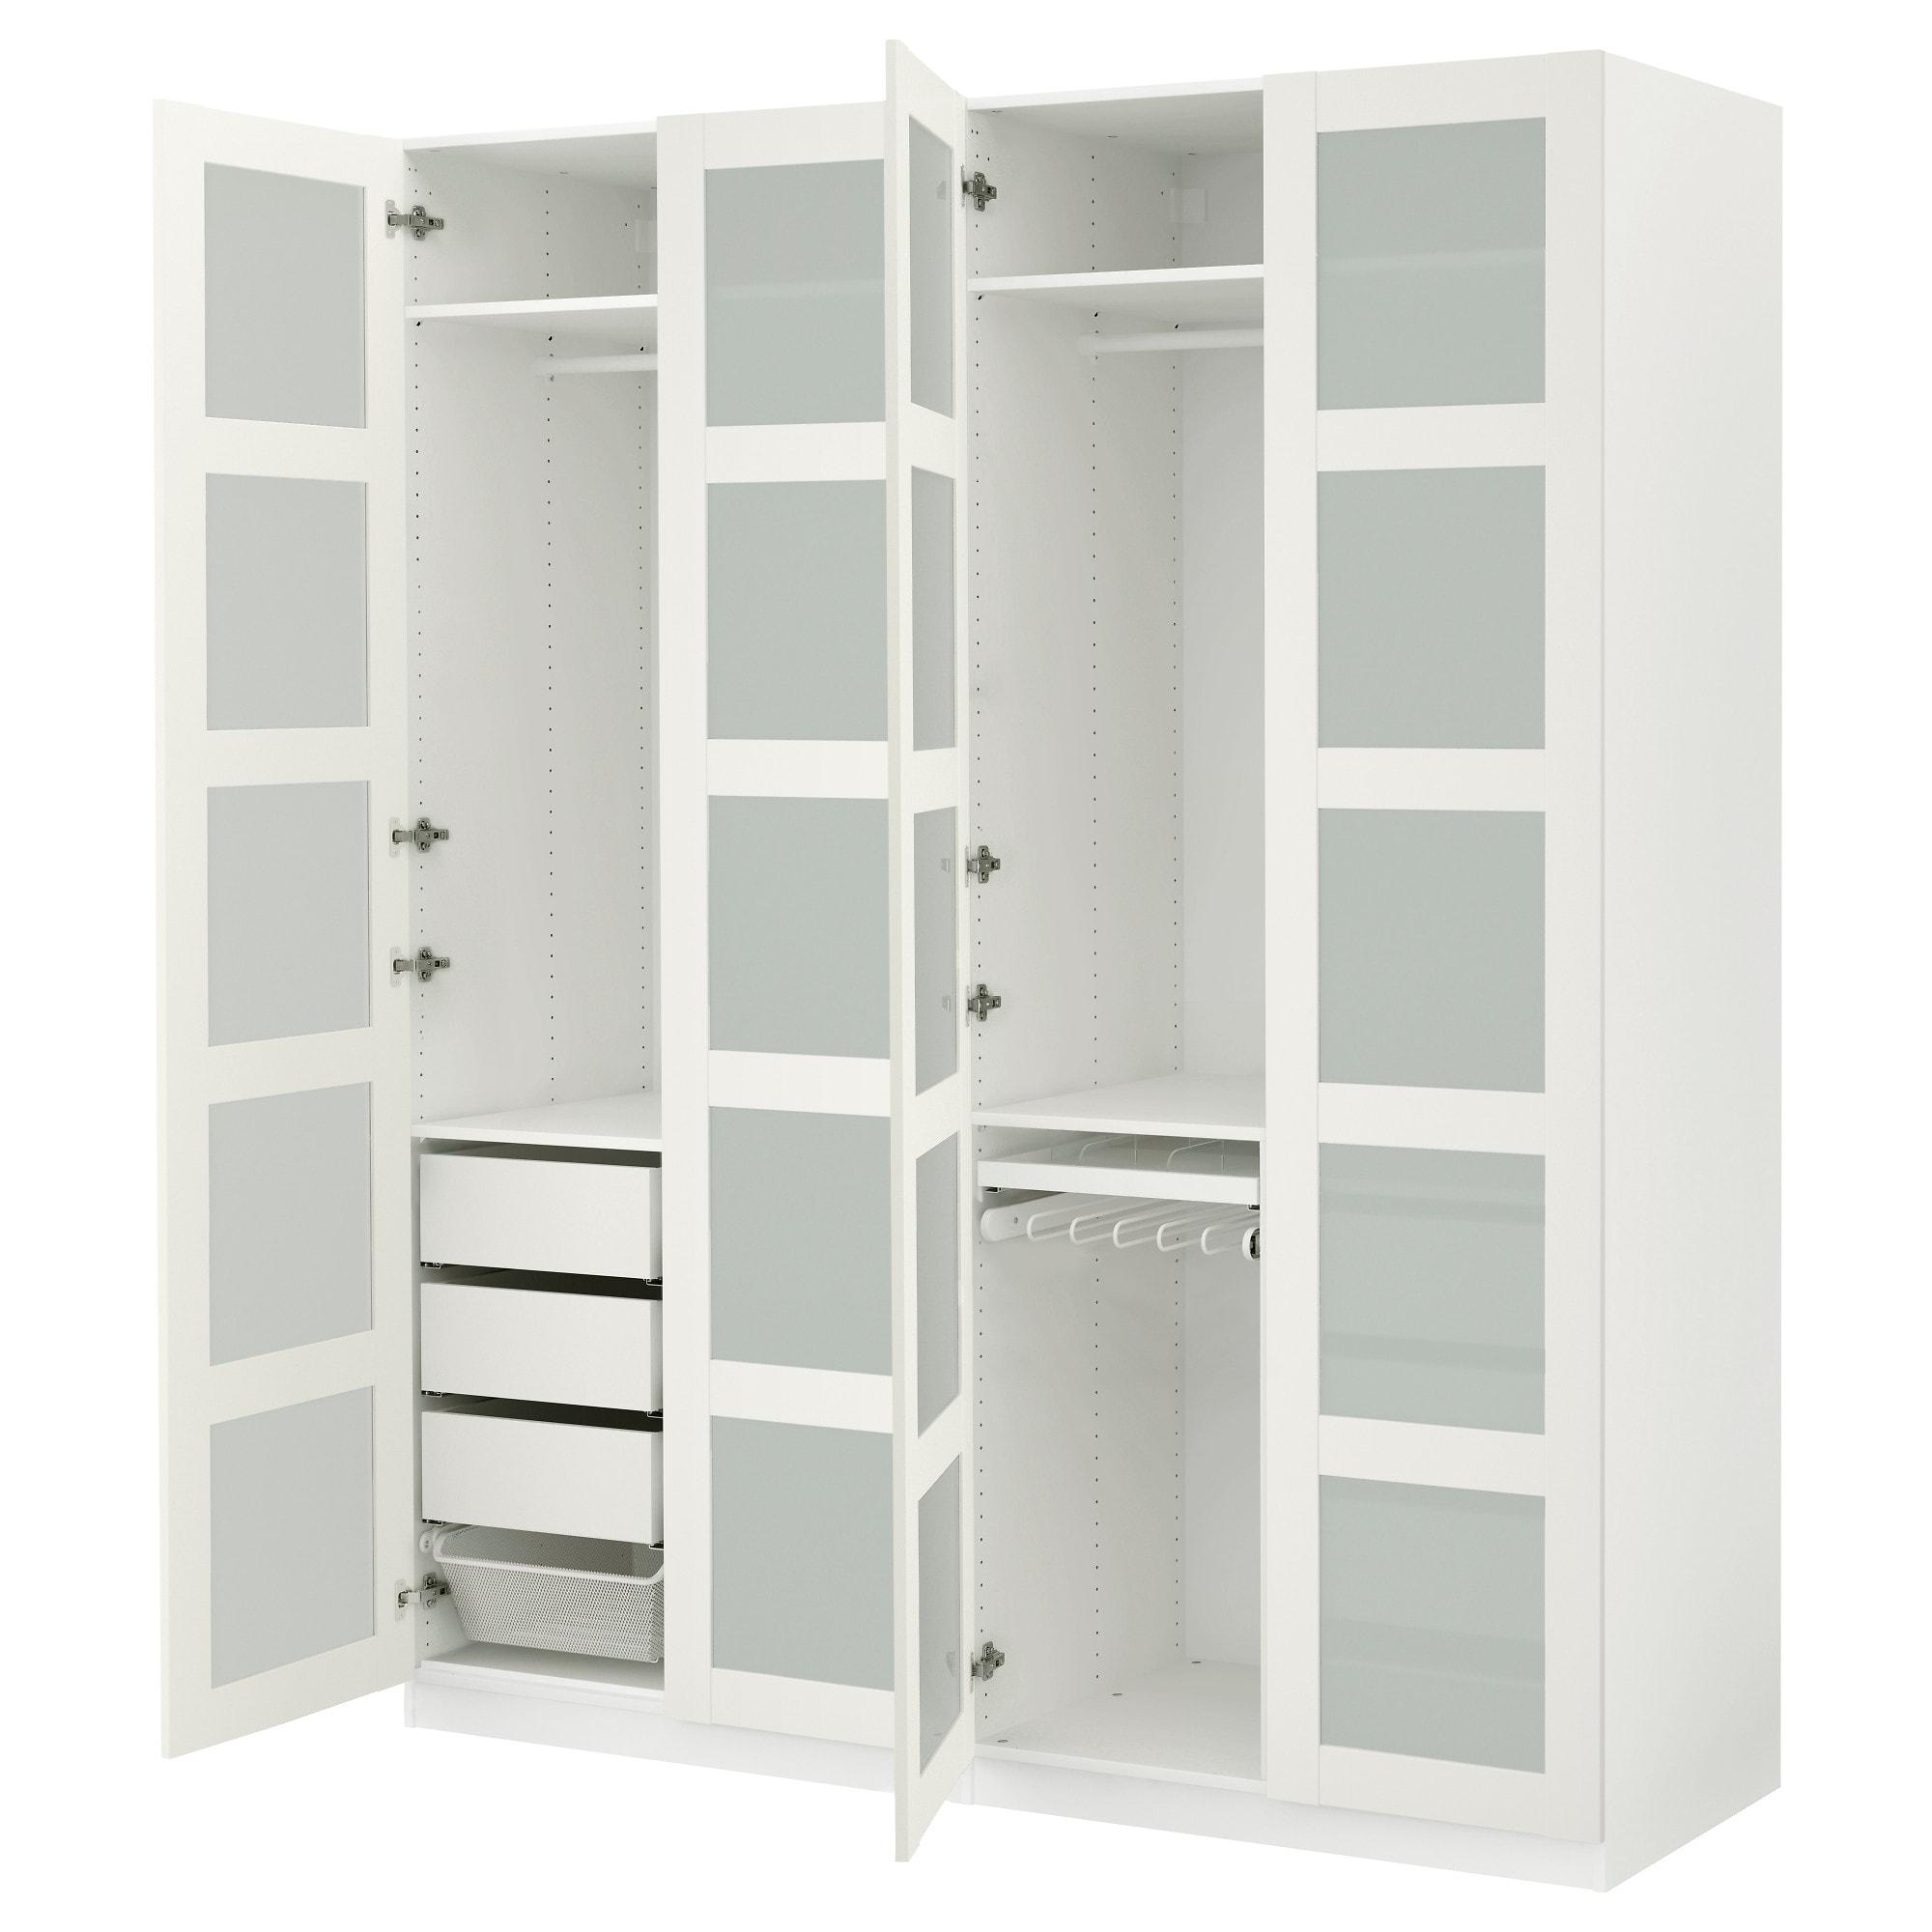 huge discount f9389 8b0b0 IKEA - PAX Wardrobe white, Bergsbo frosted glass | IKEA ...